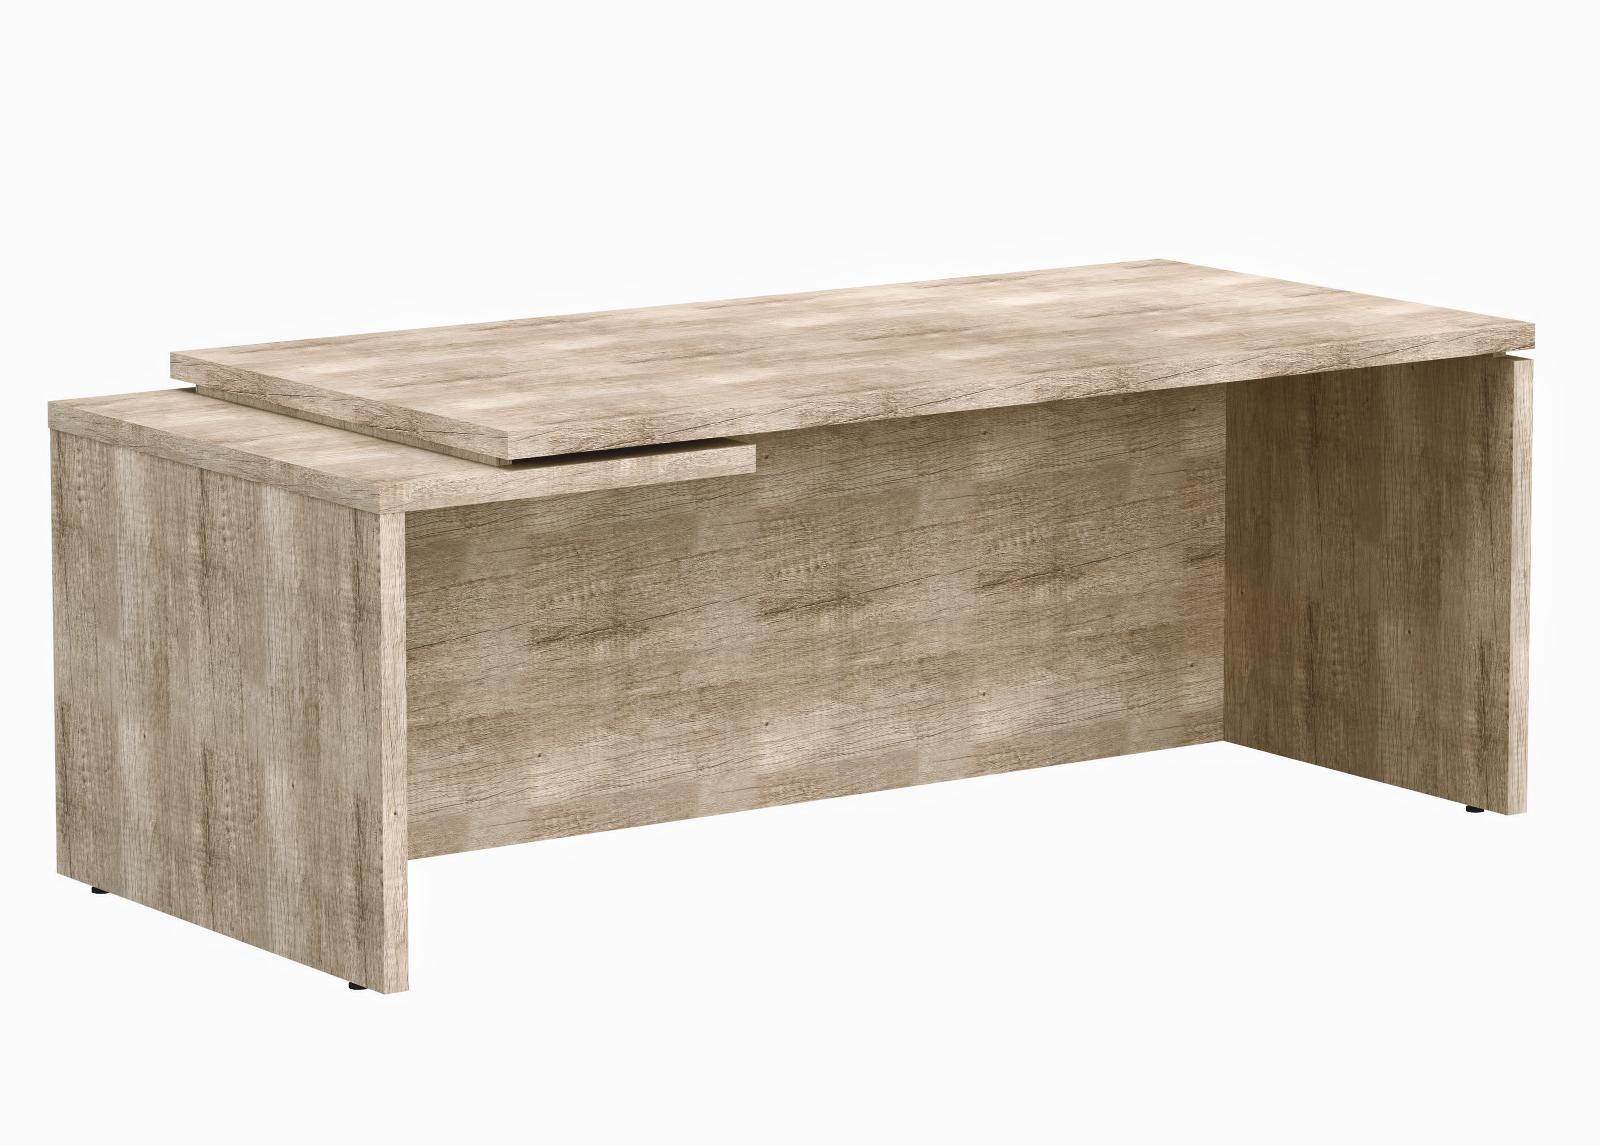 Työpöytä Torr-Z 200 cm